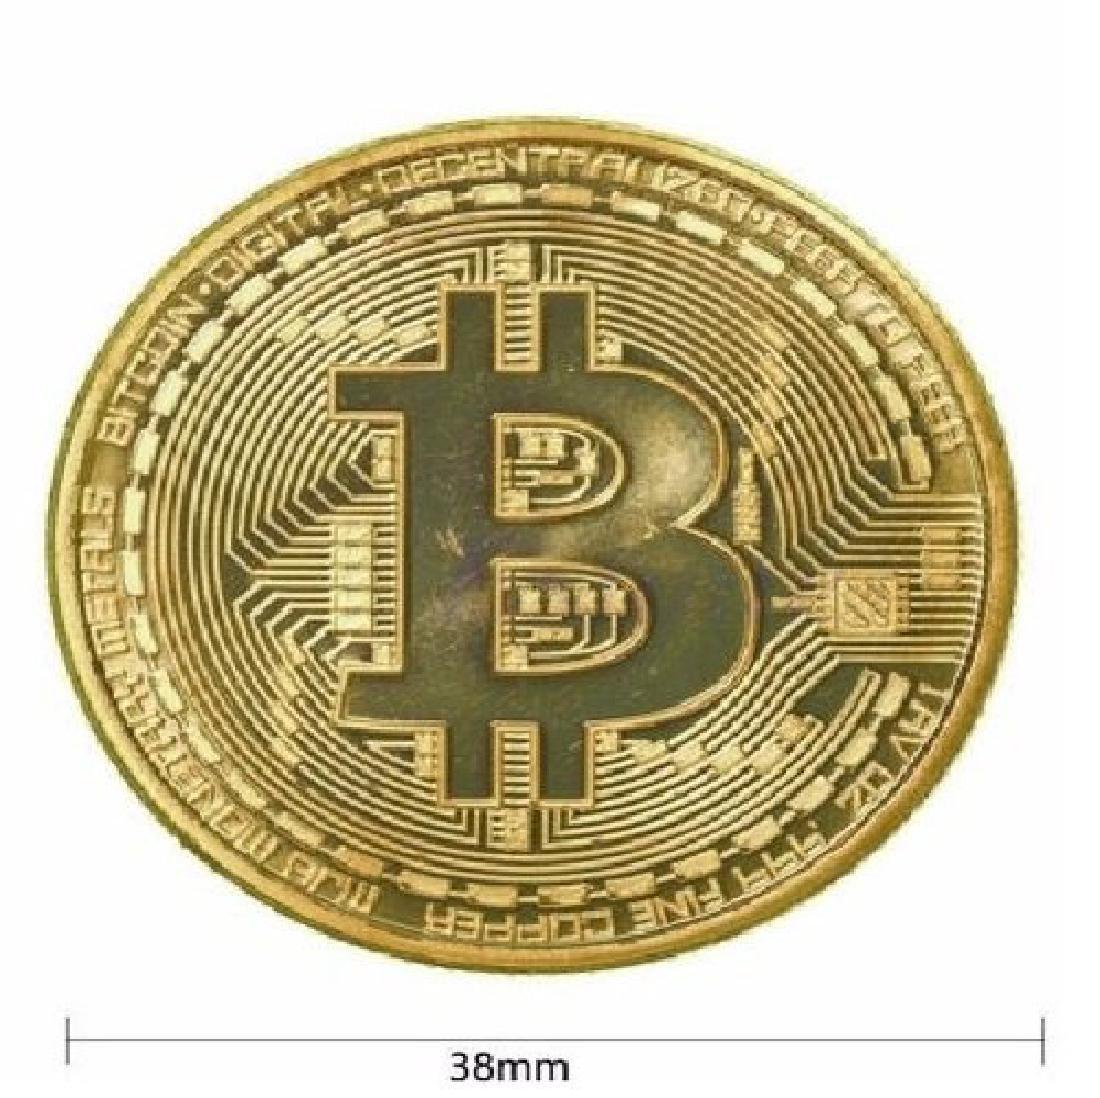 1 PCS Gold Plated Bitcoin Litecoin Ethereum Coins - 2